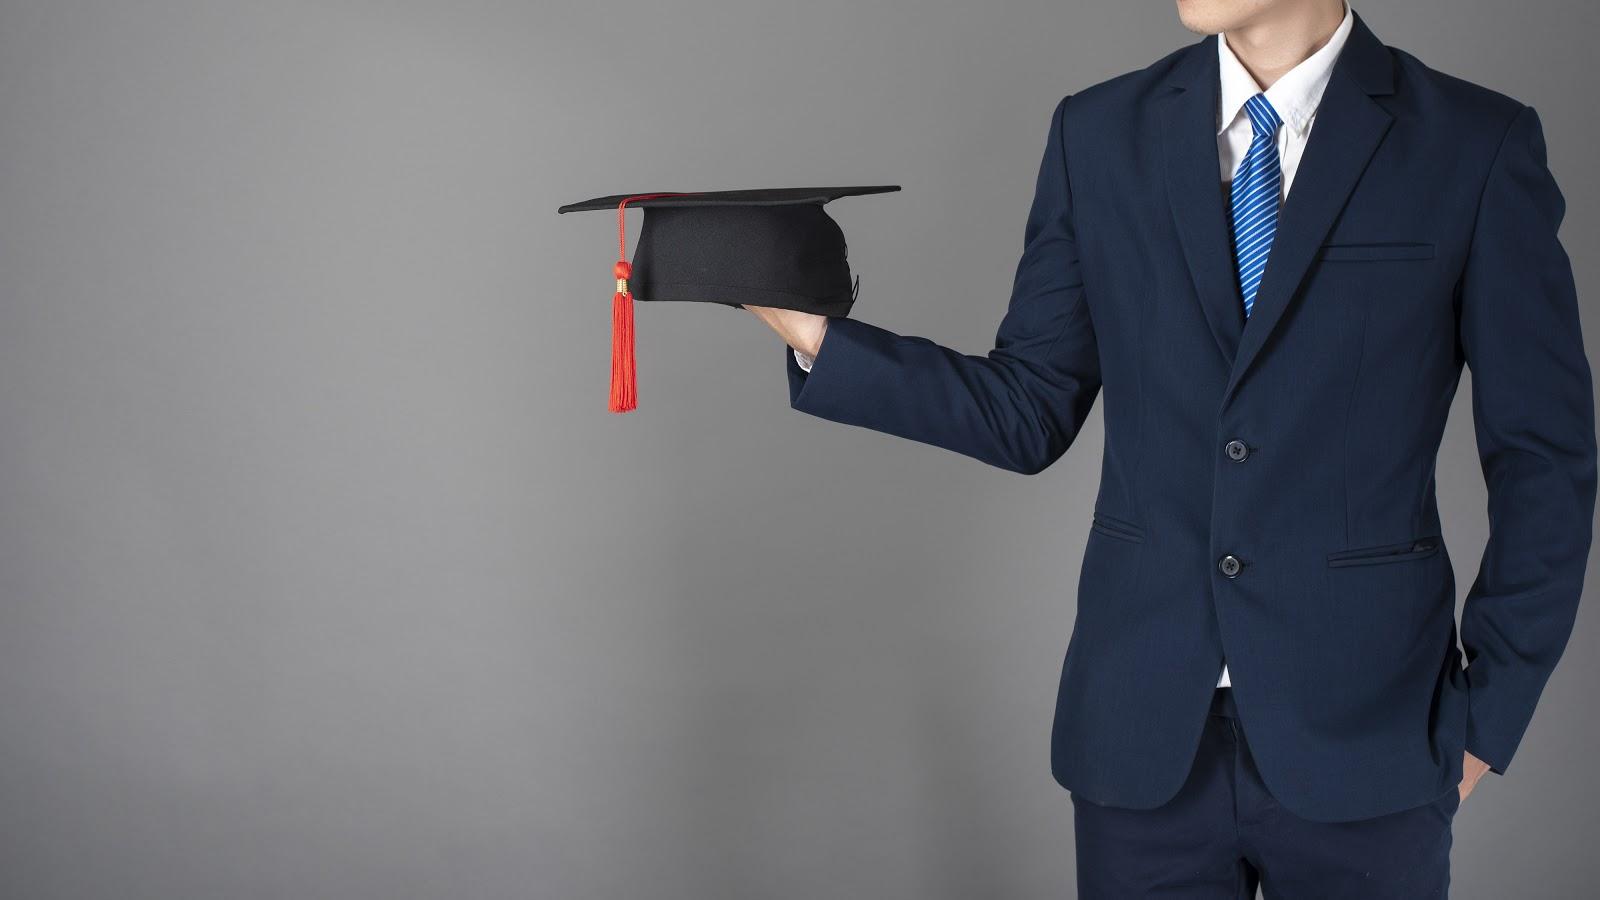 Jobs for recent college graduates: Man holds grad cap